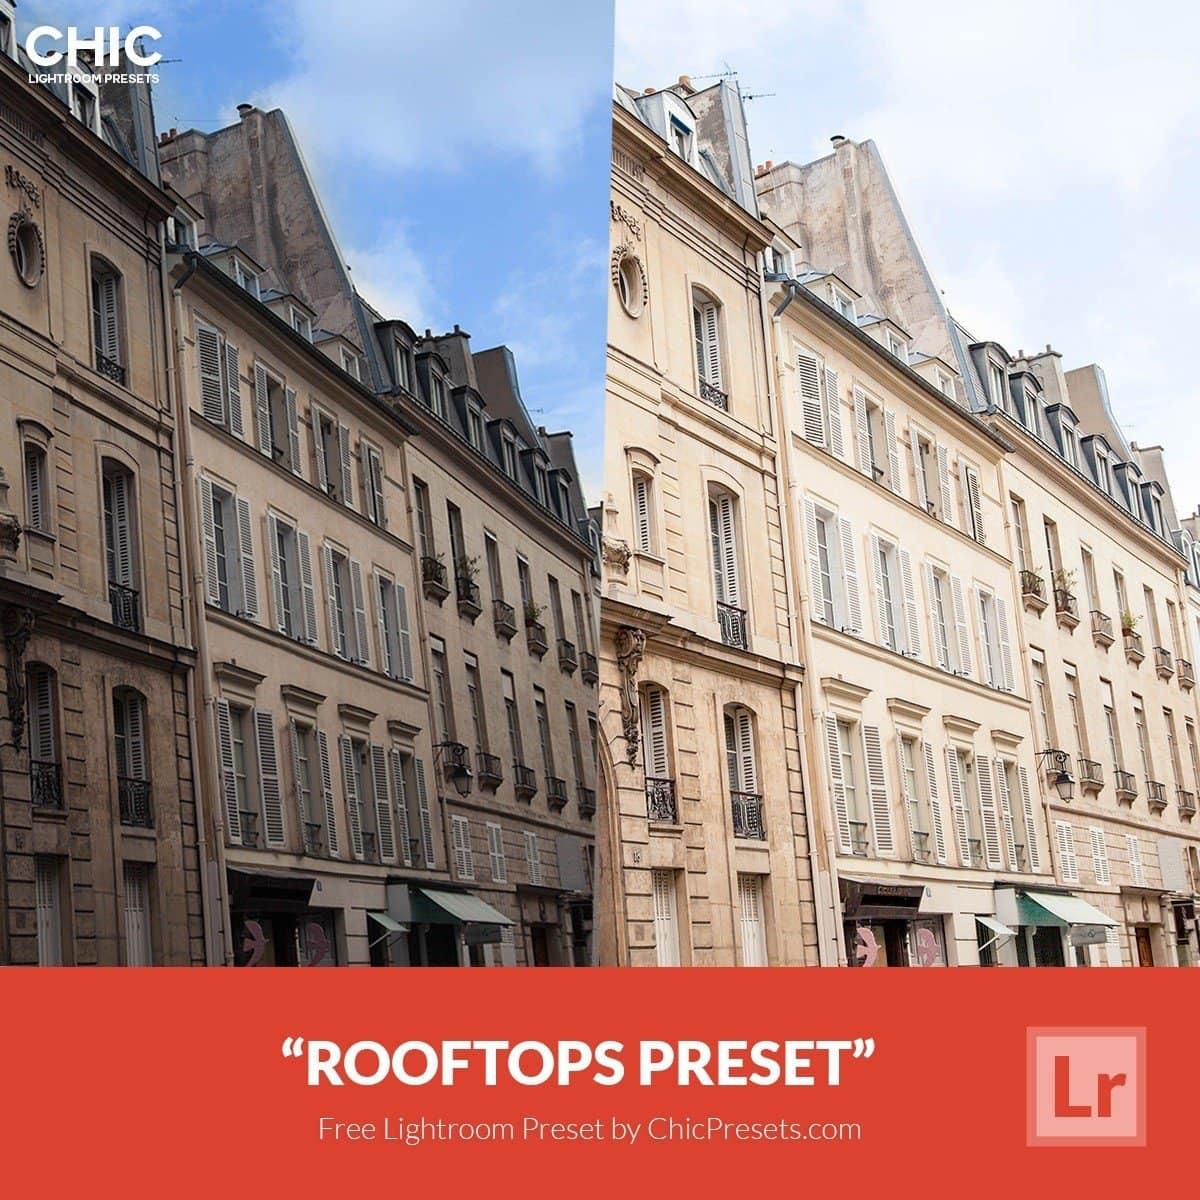 Free-Chic-Lightroom-Preset-Rooftops